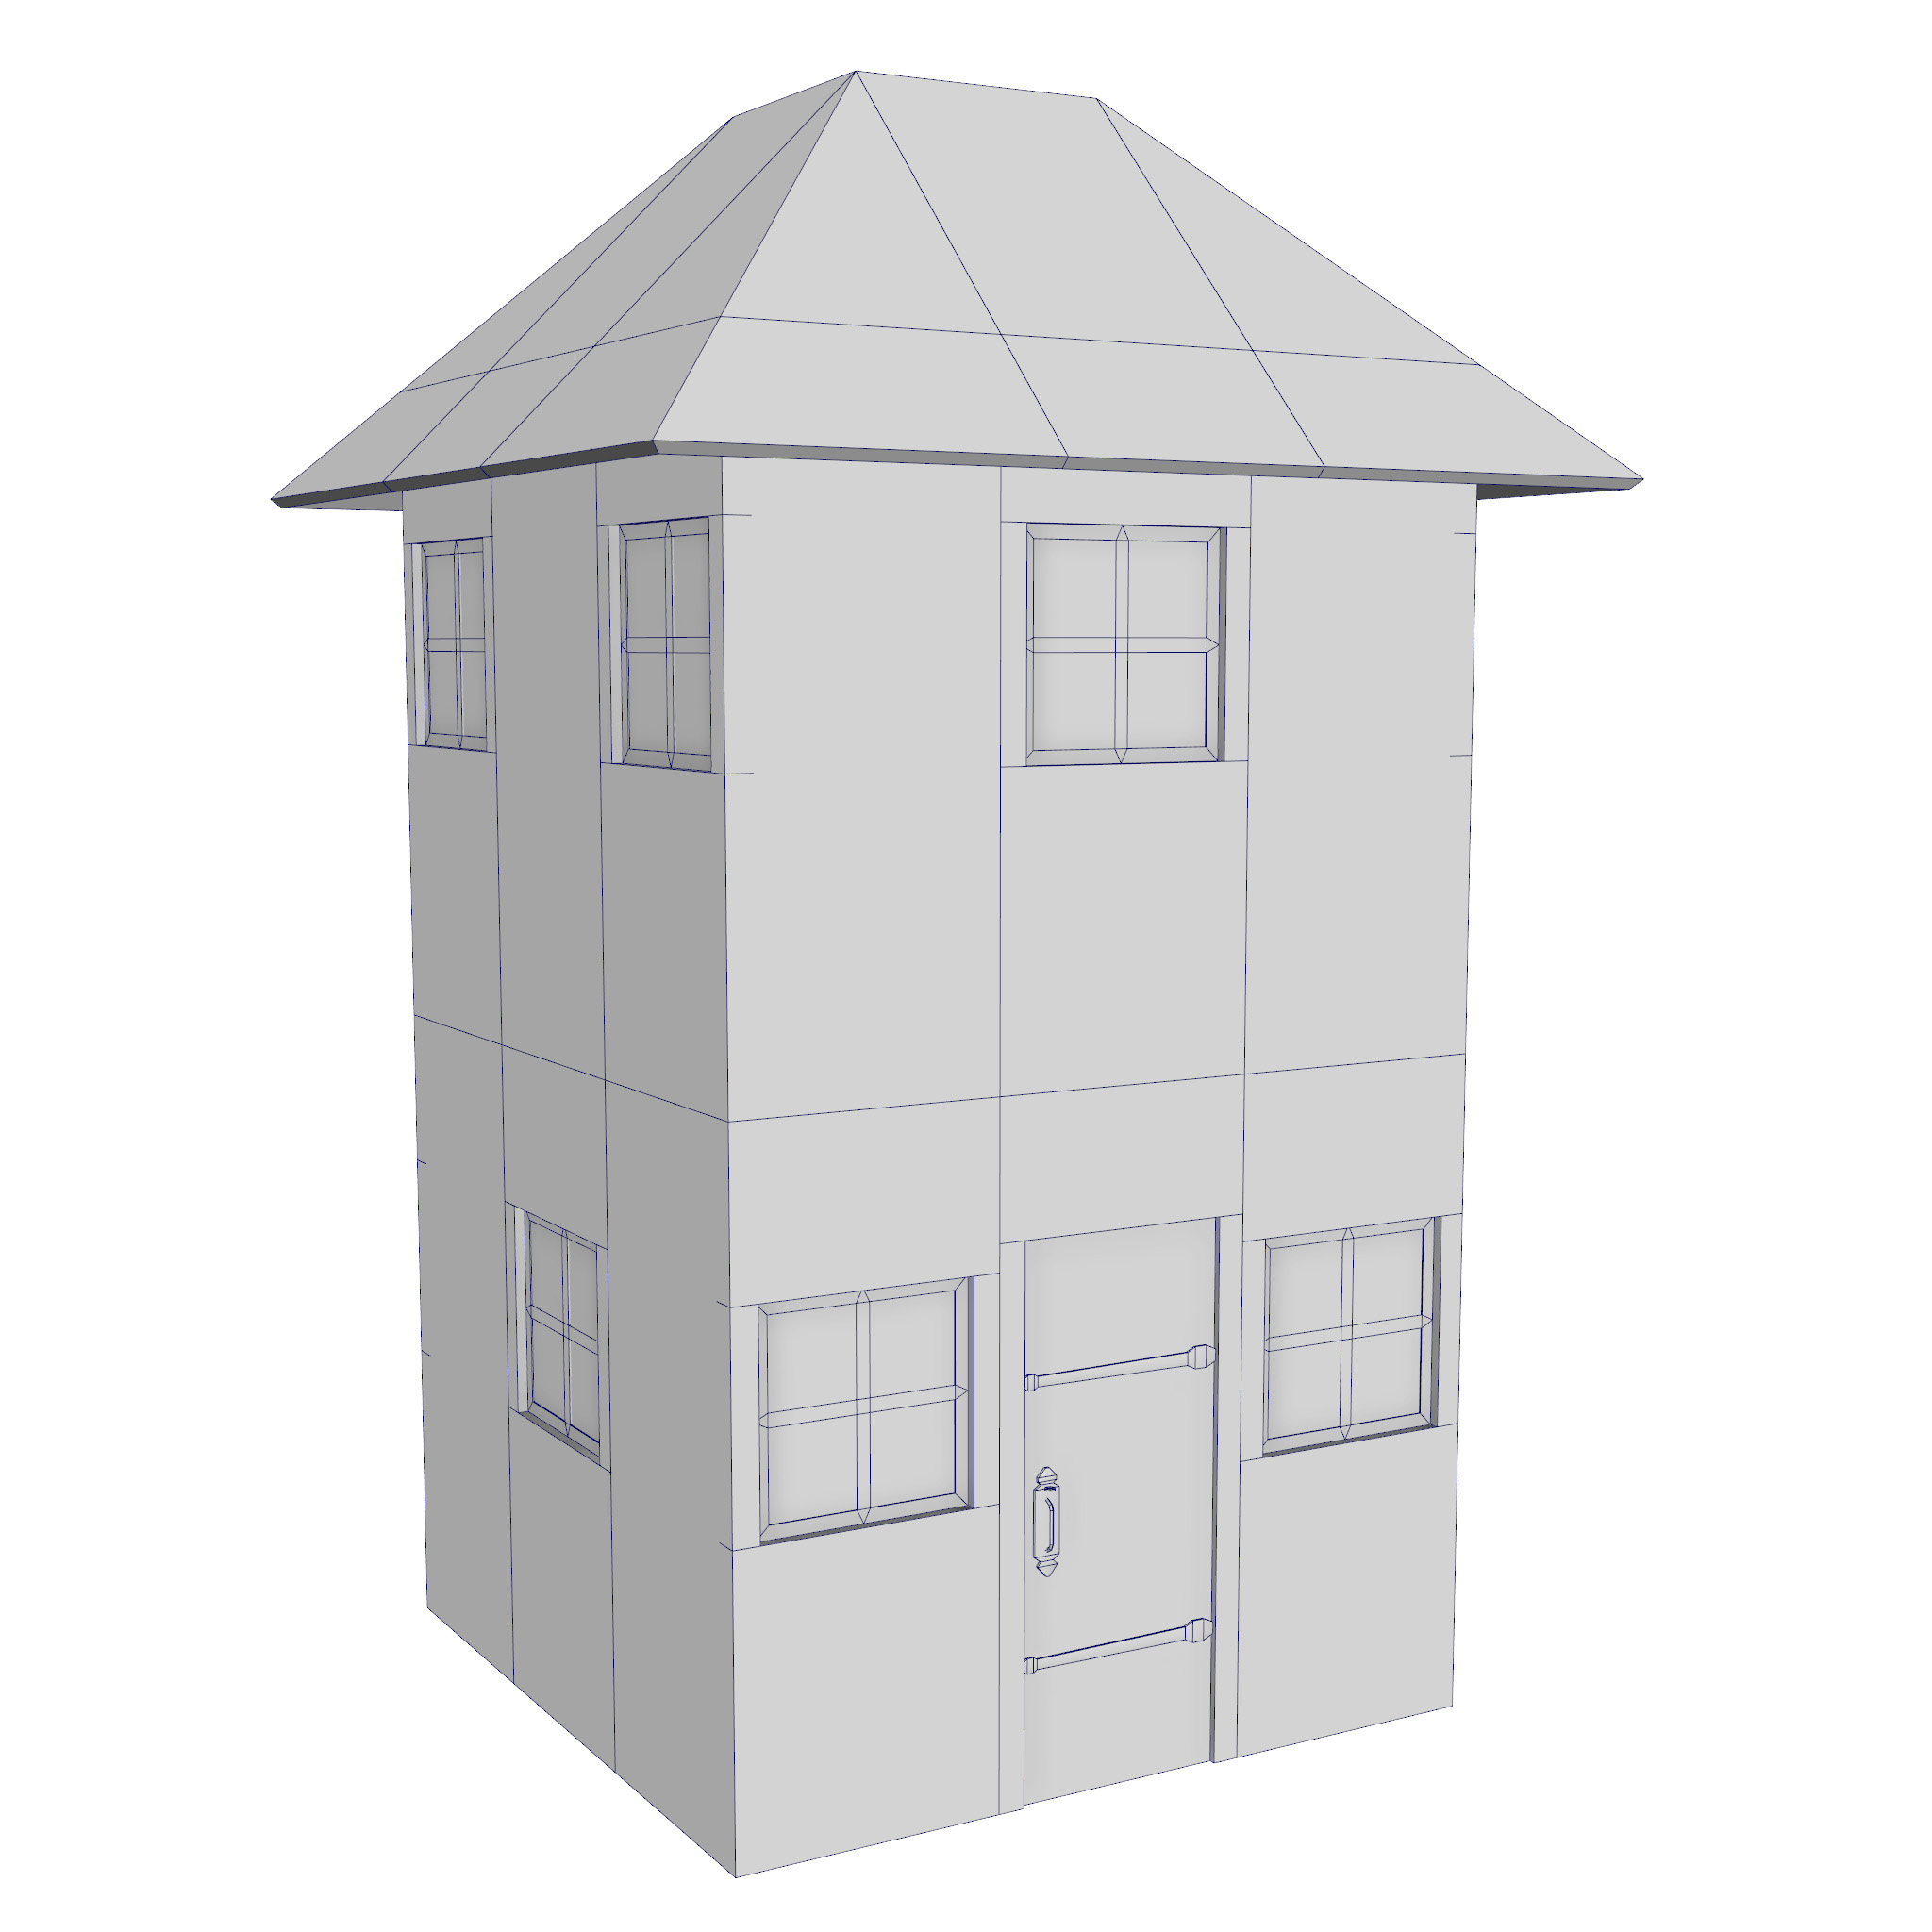 modular brick house set 3d model fbx ma mb 271405